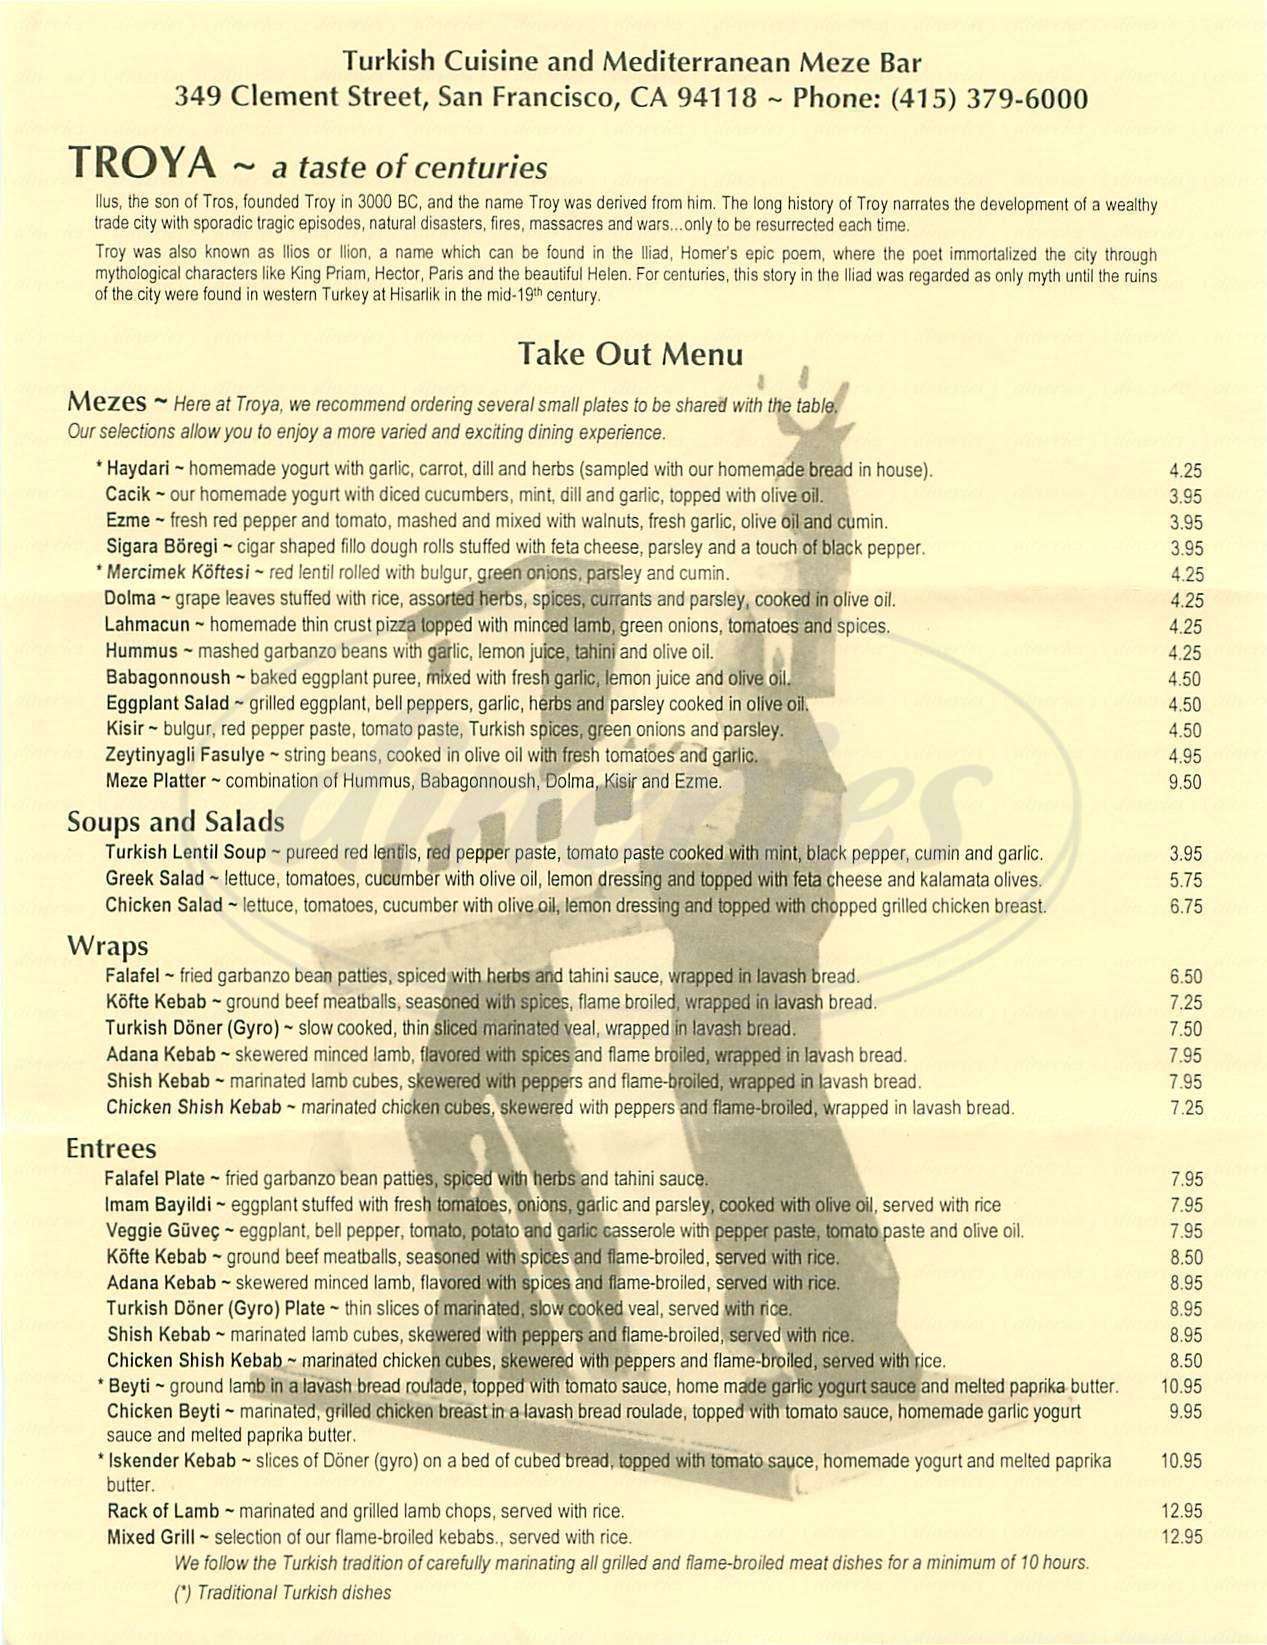 menu for Café Troya